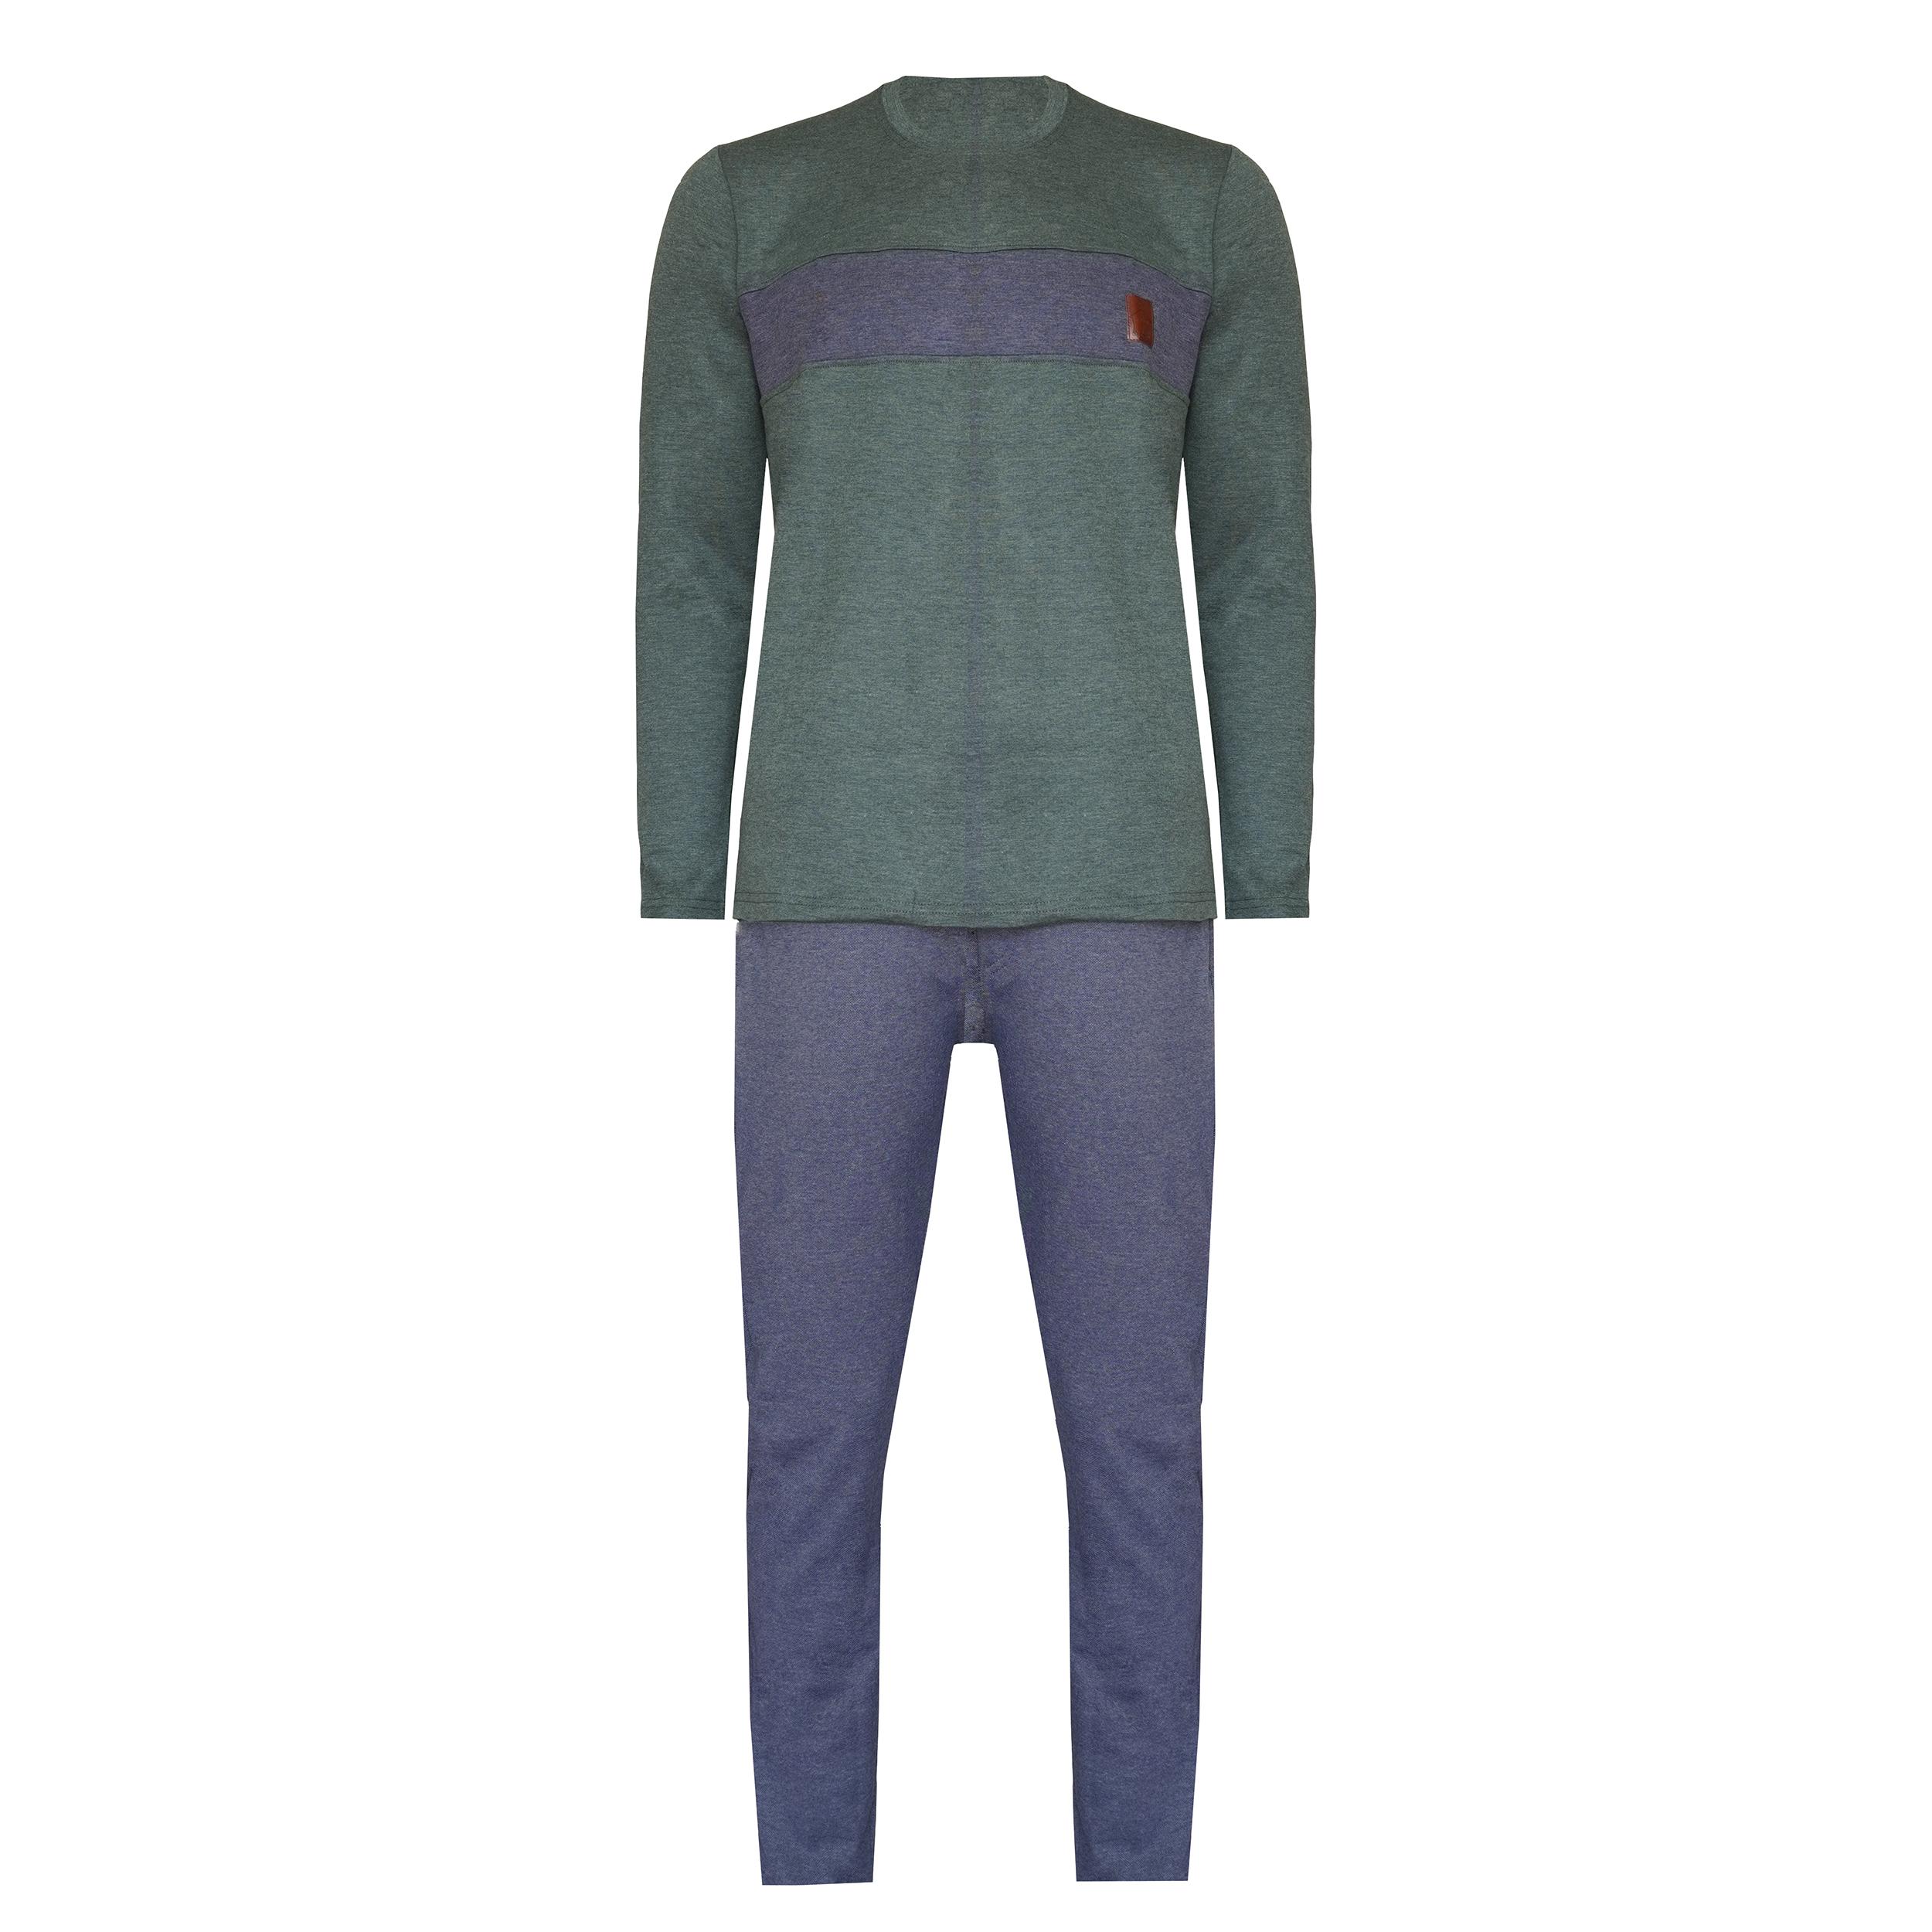 ست و سویشرت و شلوار مردانه لباس خونه کد 990804